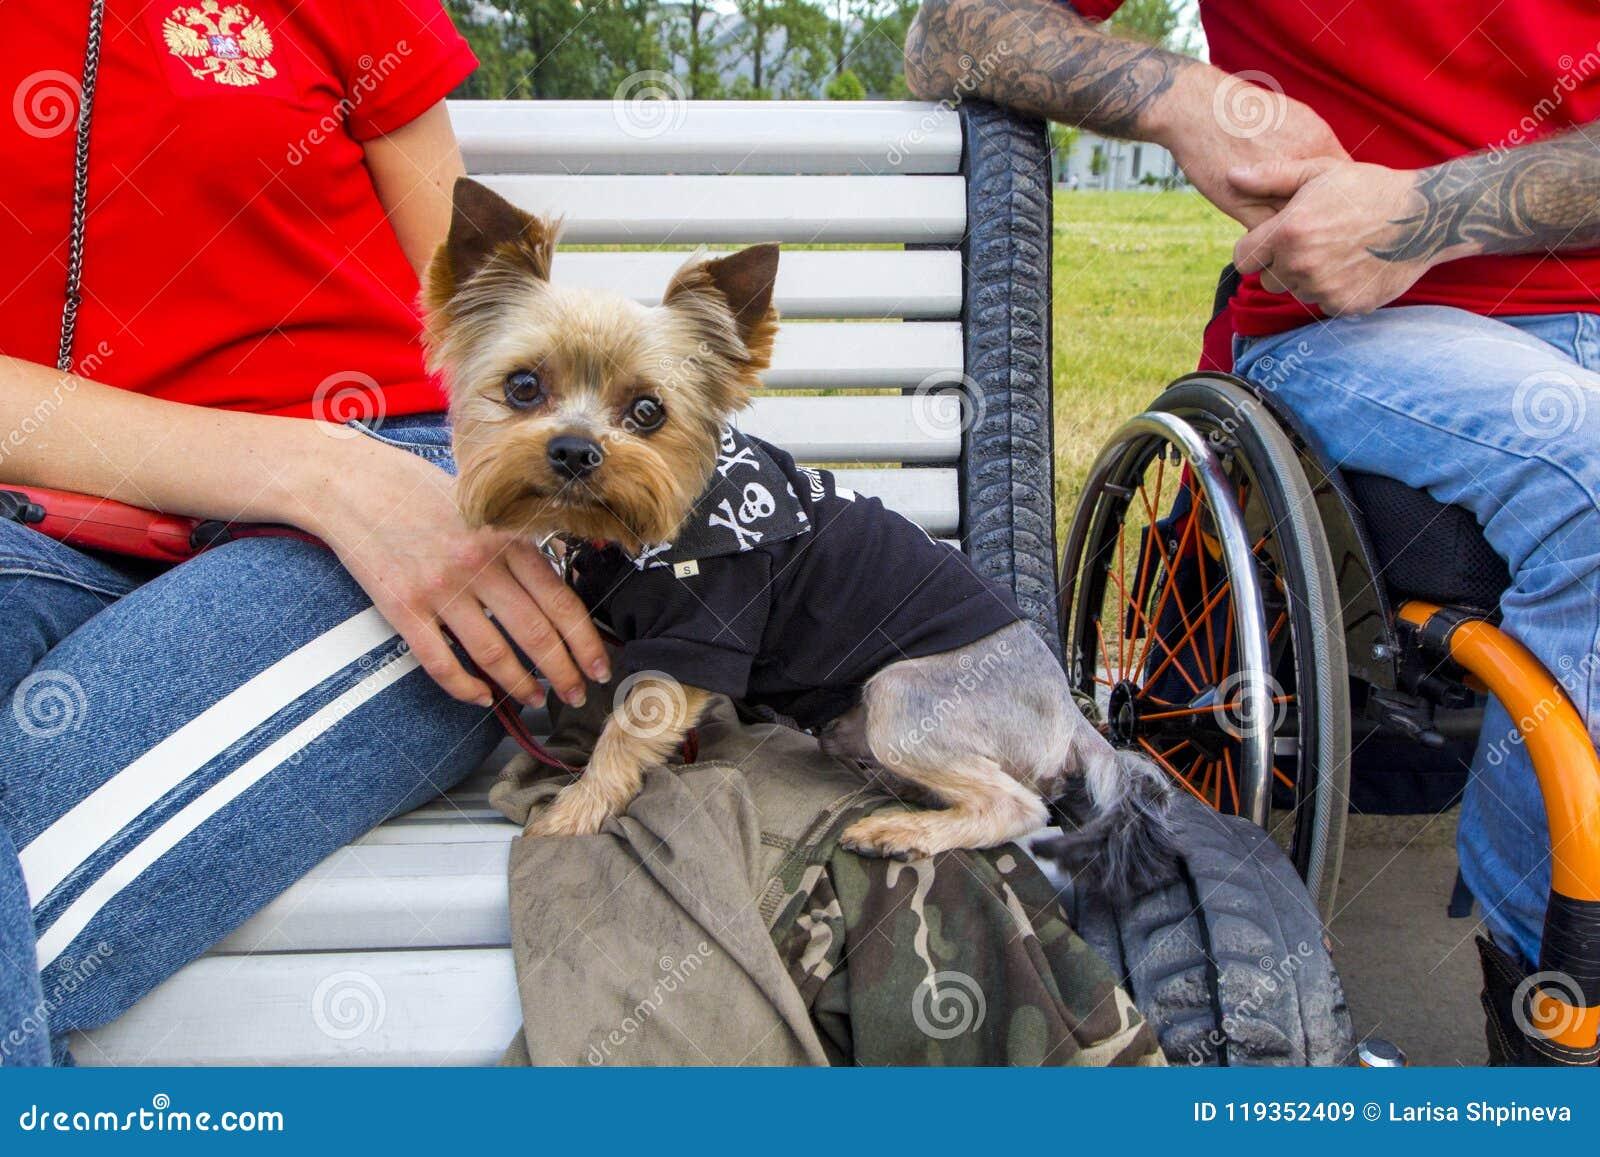 Peachy Cute Pet Dog Sits On Bench With Host In Wheelchair Frankydiablos Diy Chair Ideas Frankydiabloscom